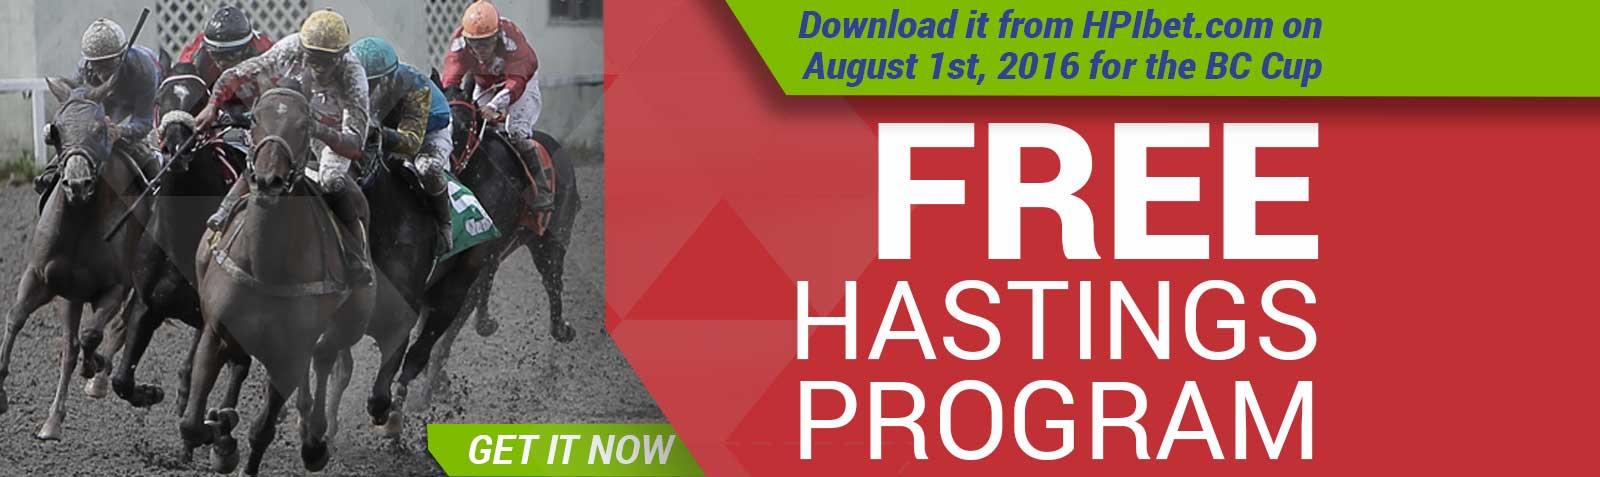 HPI16-208-HPI-Free-Program-Rev-Slider